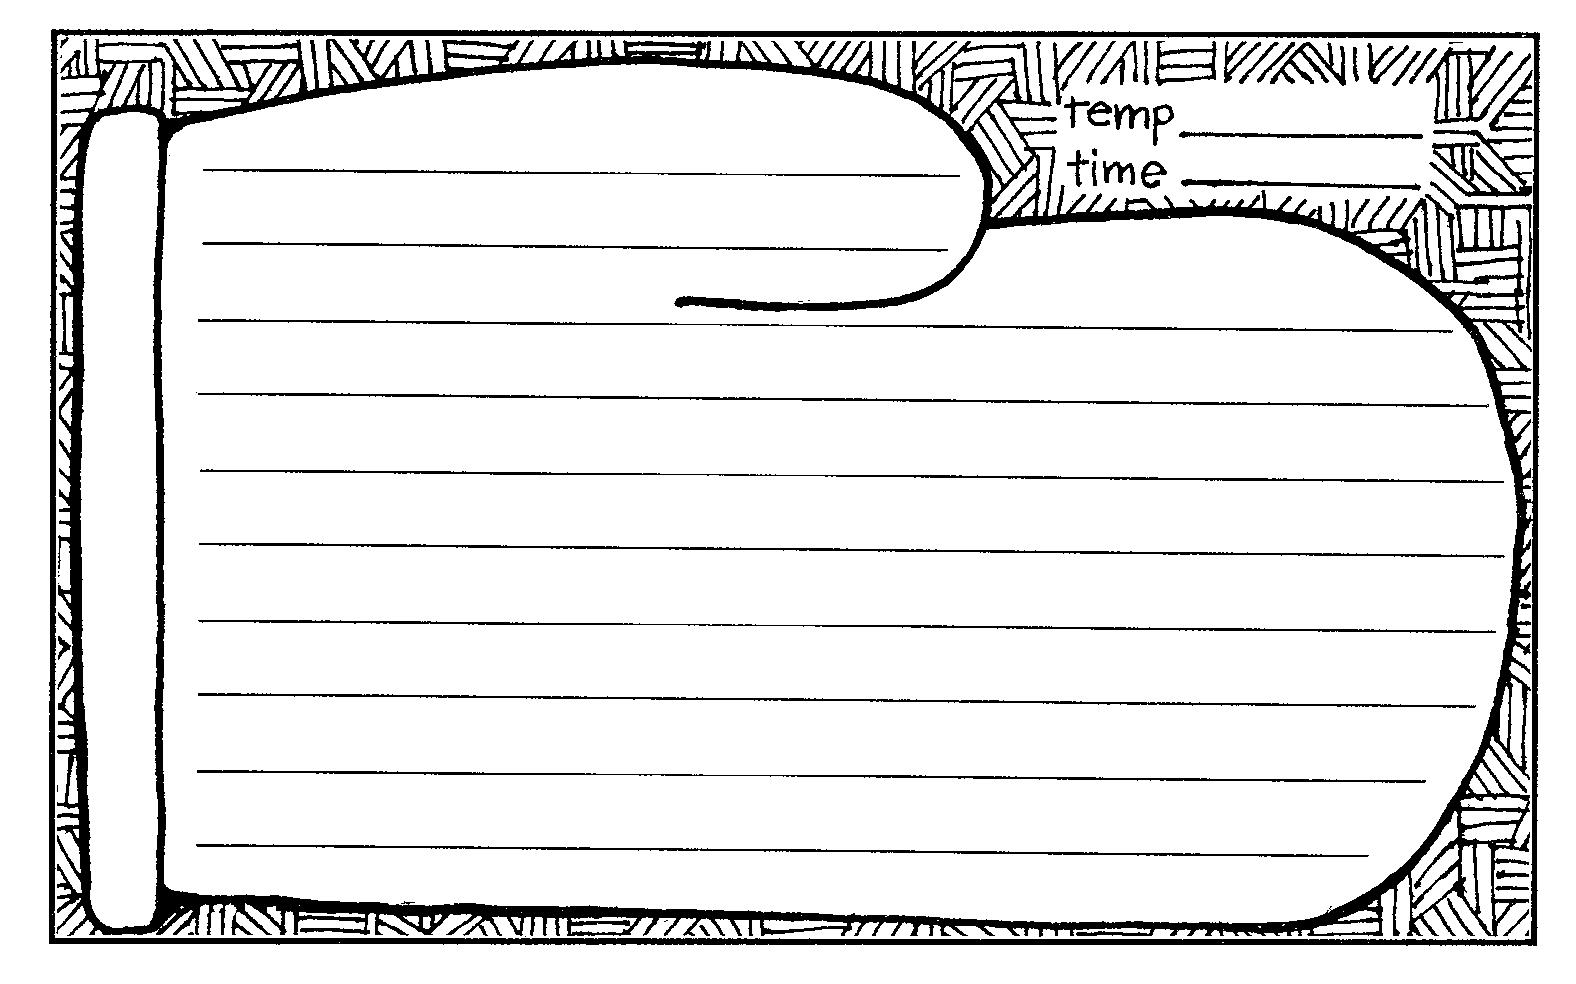 Free Recipe Card Clipart, Download Free Clip Art, Free Clip.